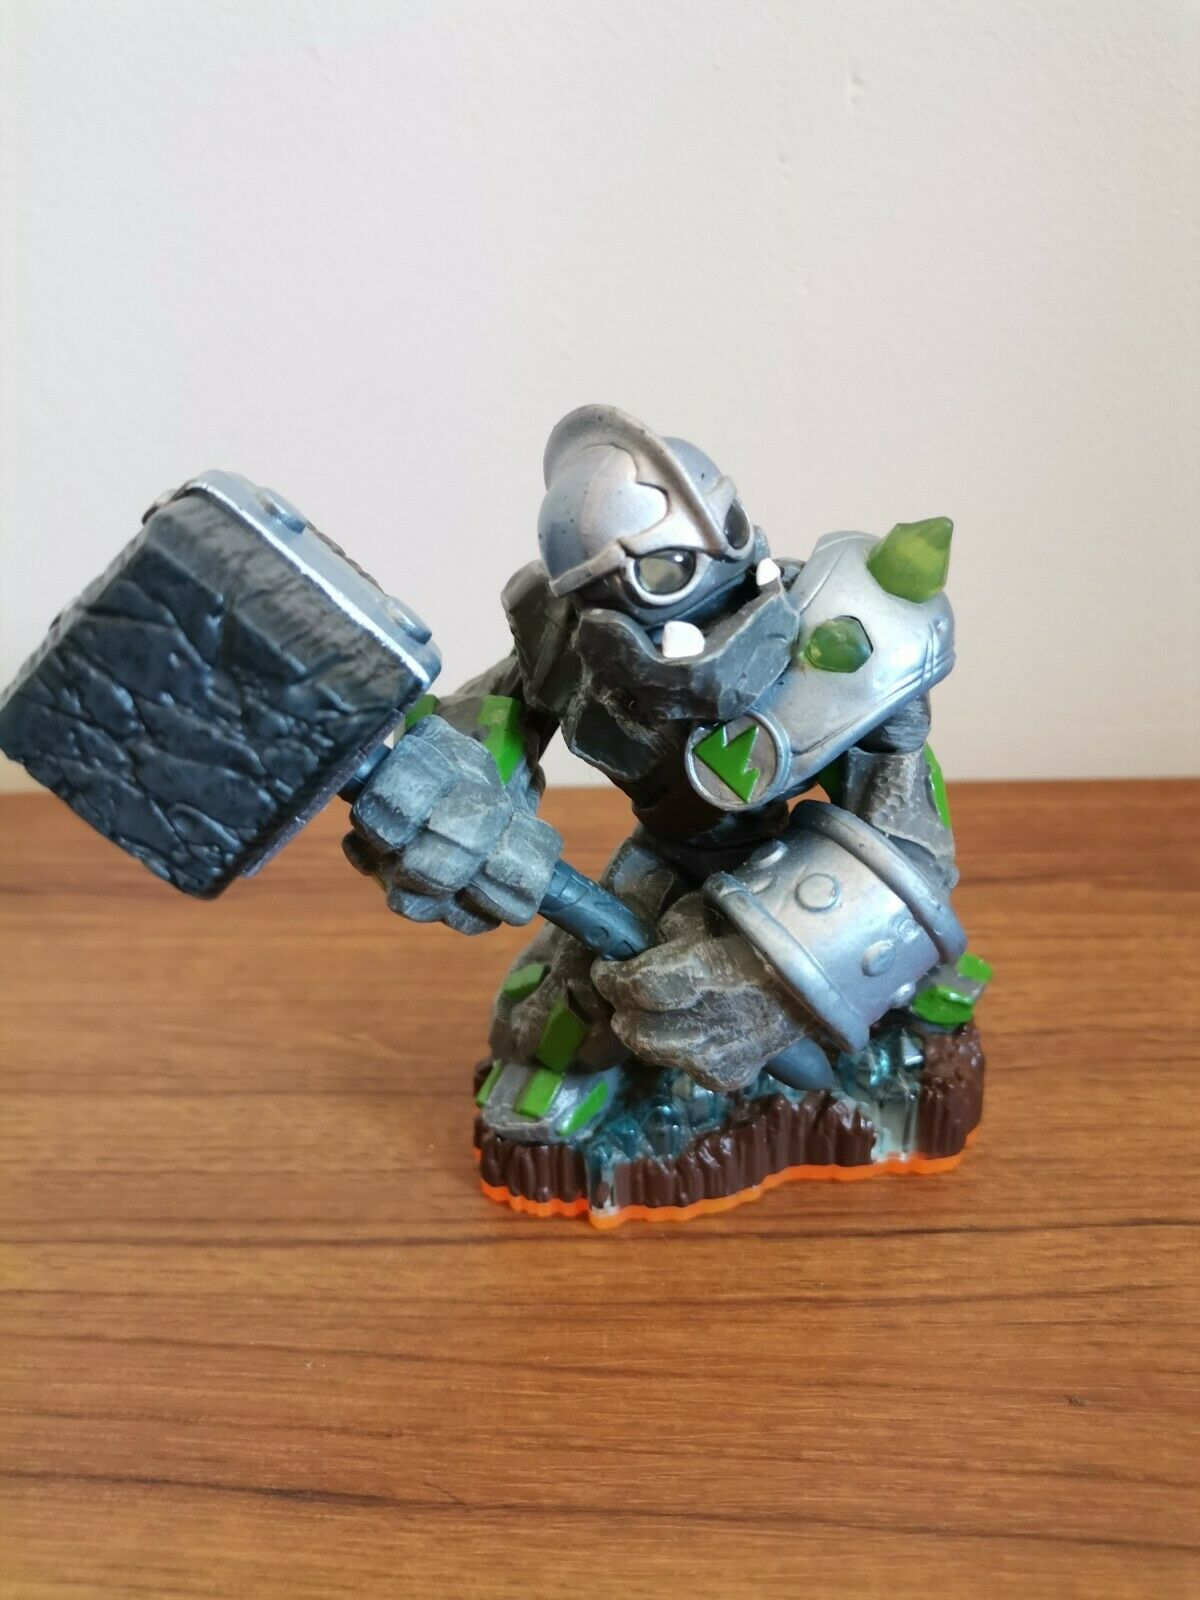 Skylanders Granite Crusher Figure 84515888 Xbox PS3 PS4 Spyro's Wii swop force